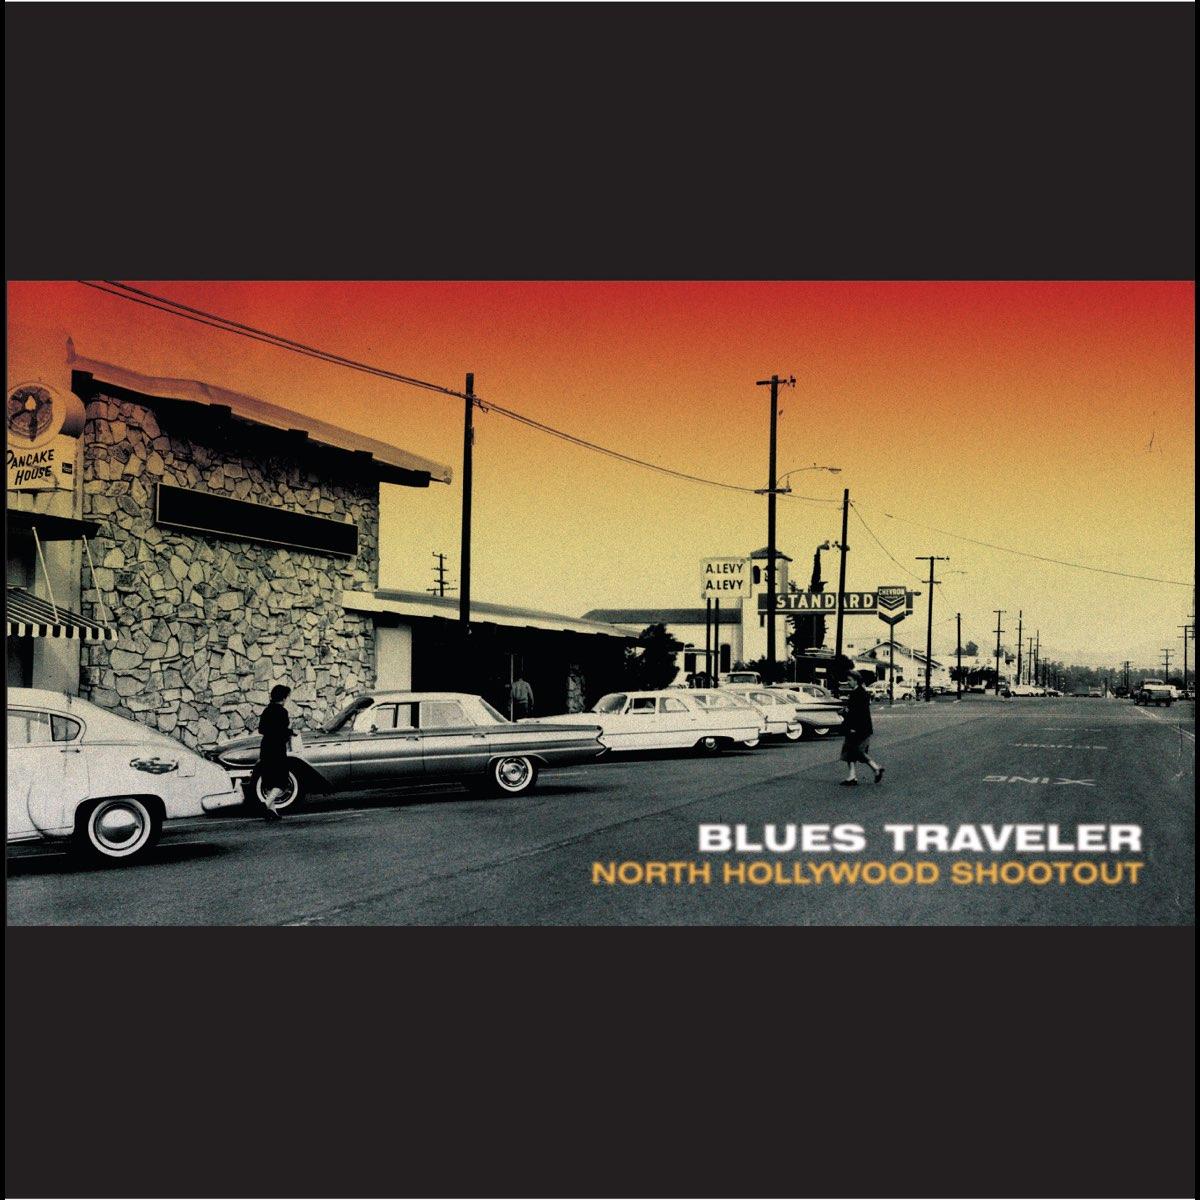 Blues Traveler, North Hollywood Shootout